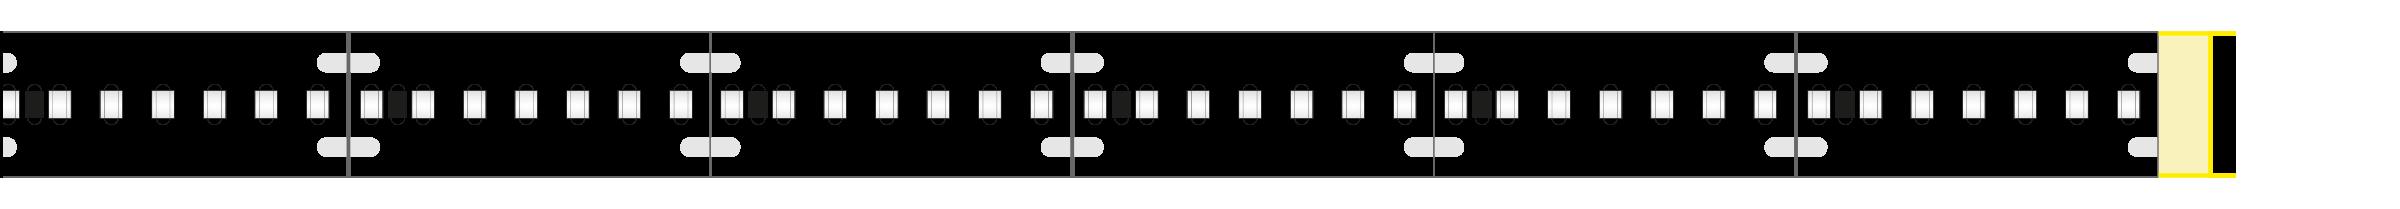 uv-c led flexbaender betriebszustand